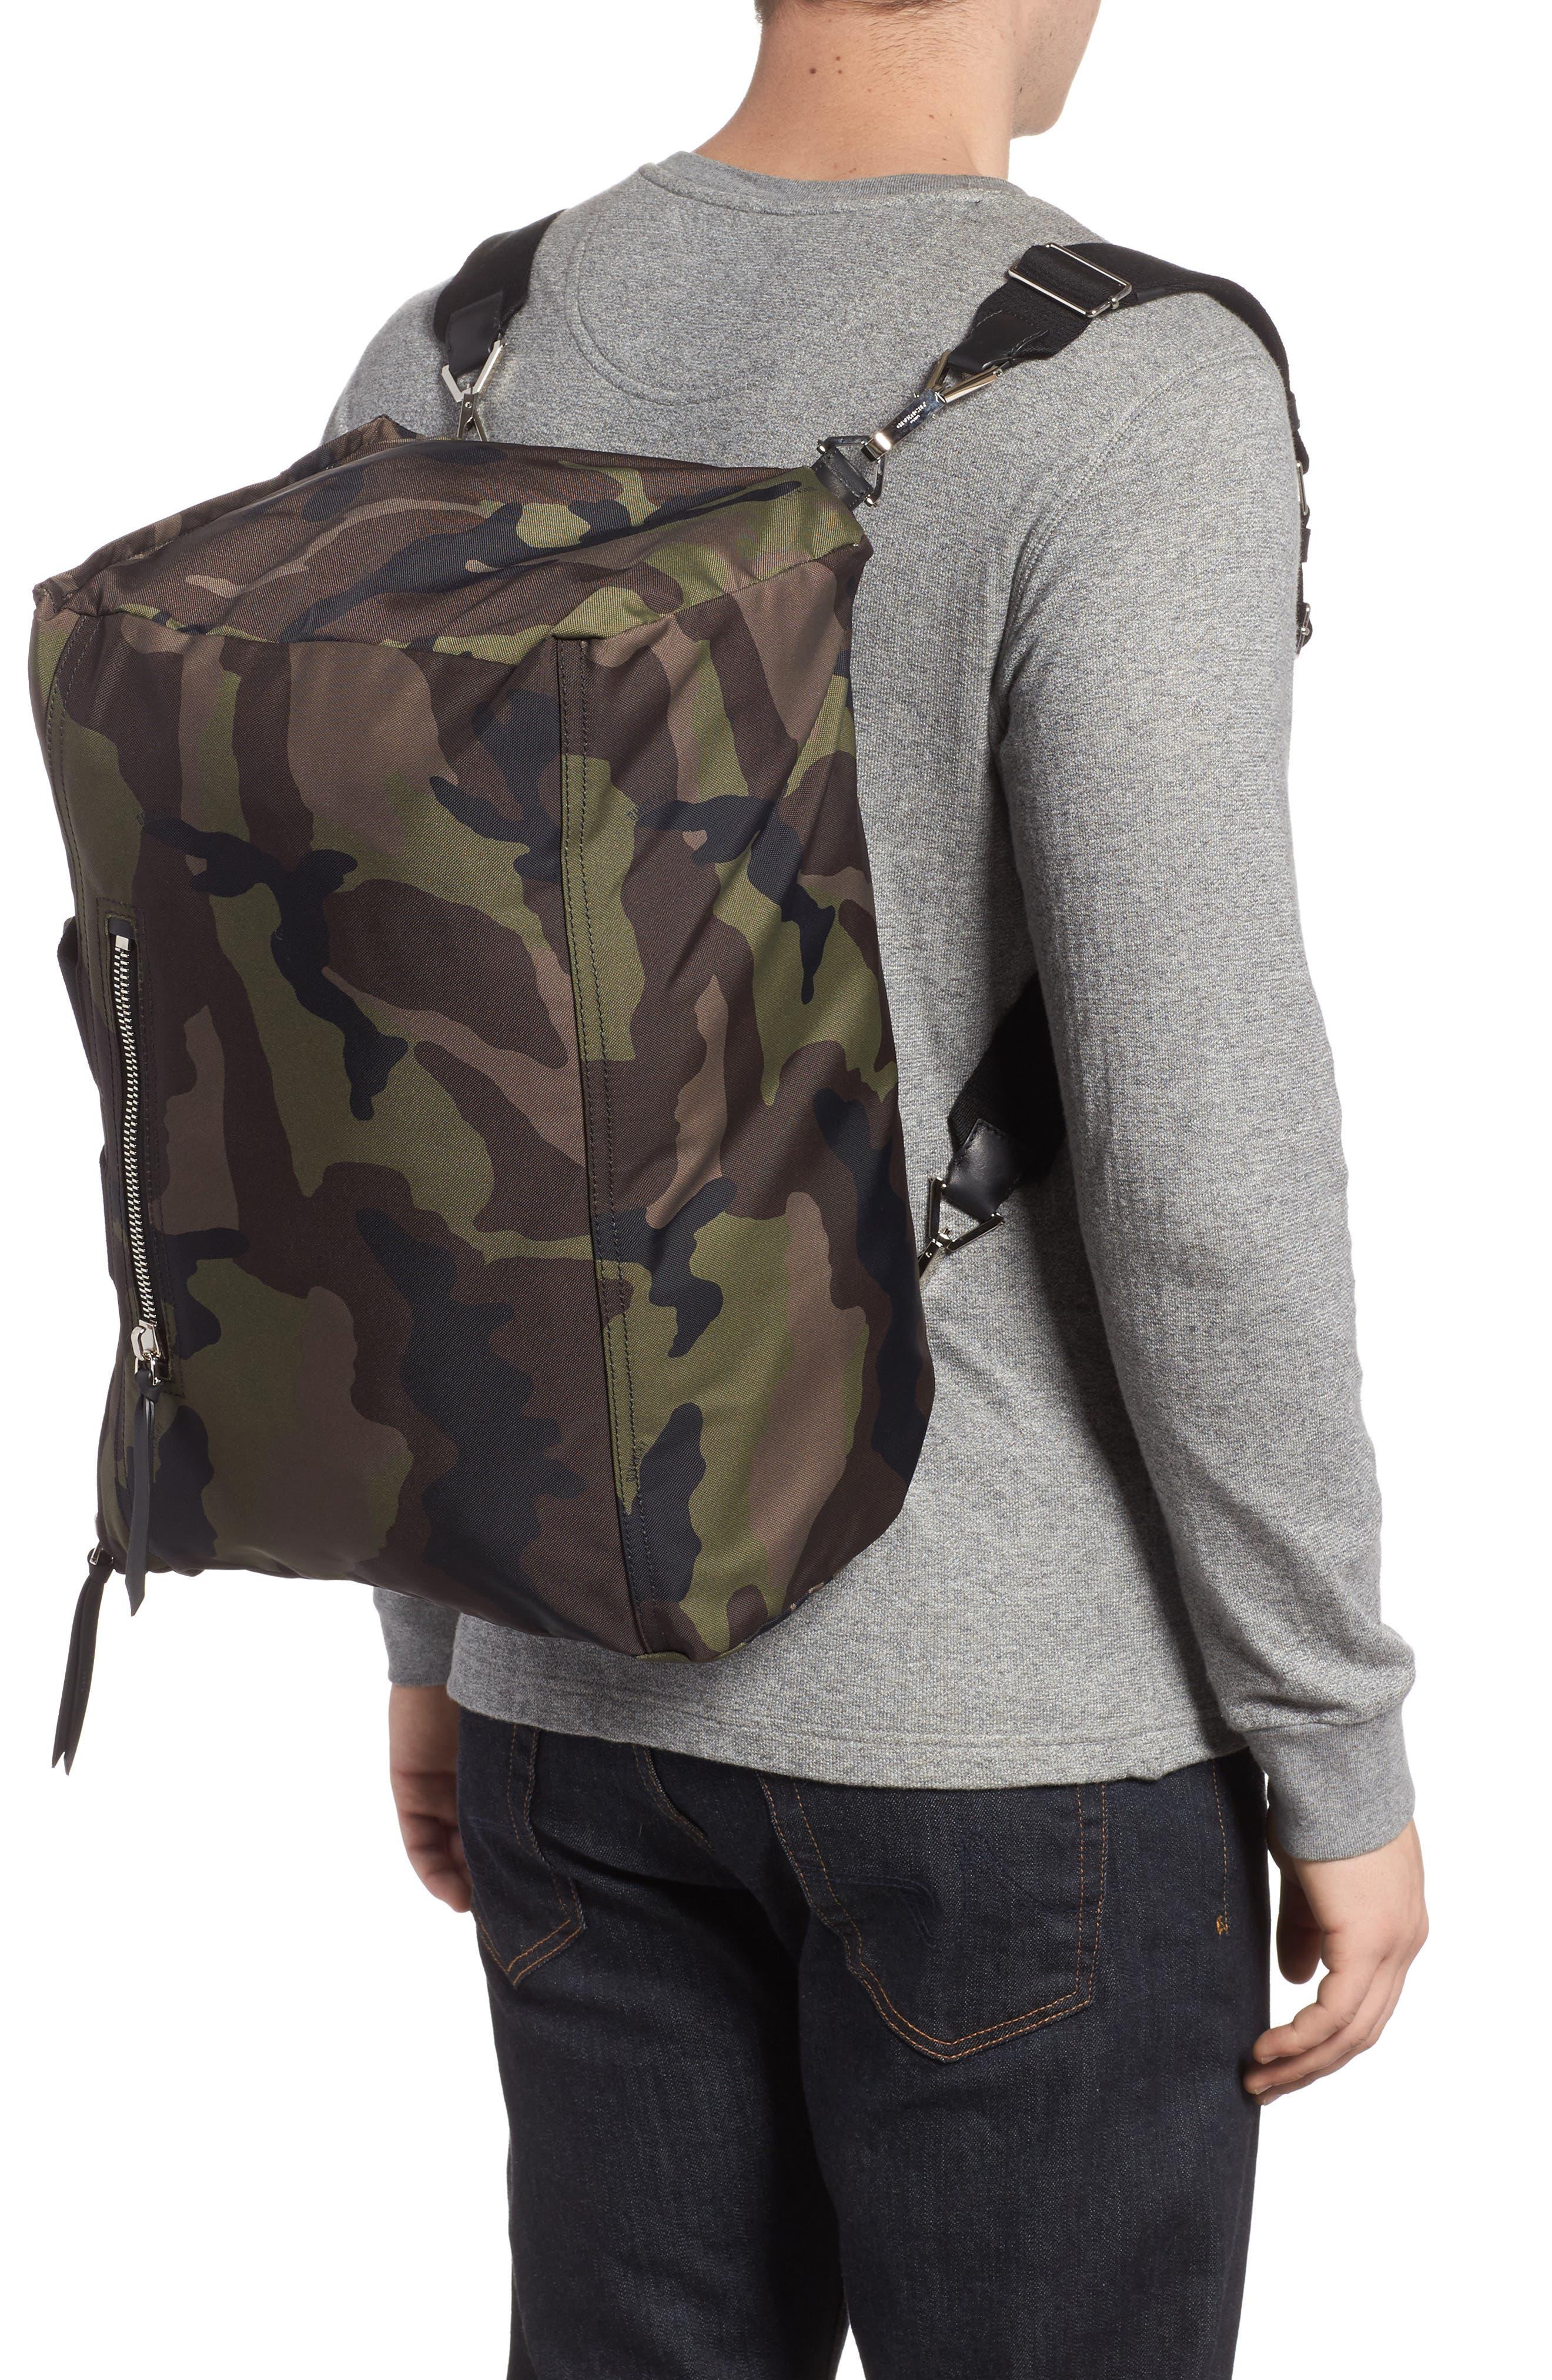 Pandora Camo Convertible Backpack,                             Alternate thumbnail 2, color,                             Multicolored